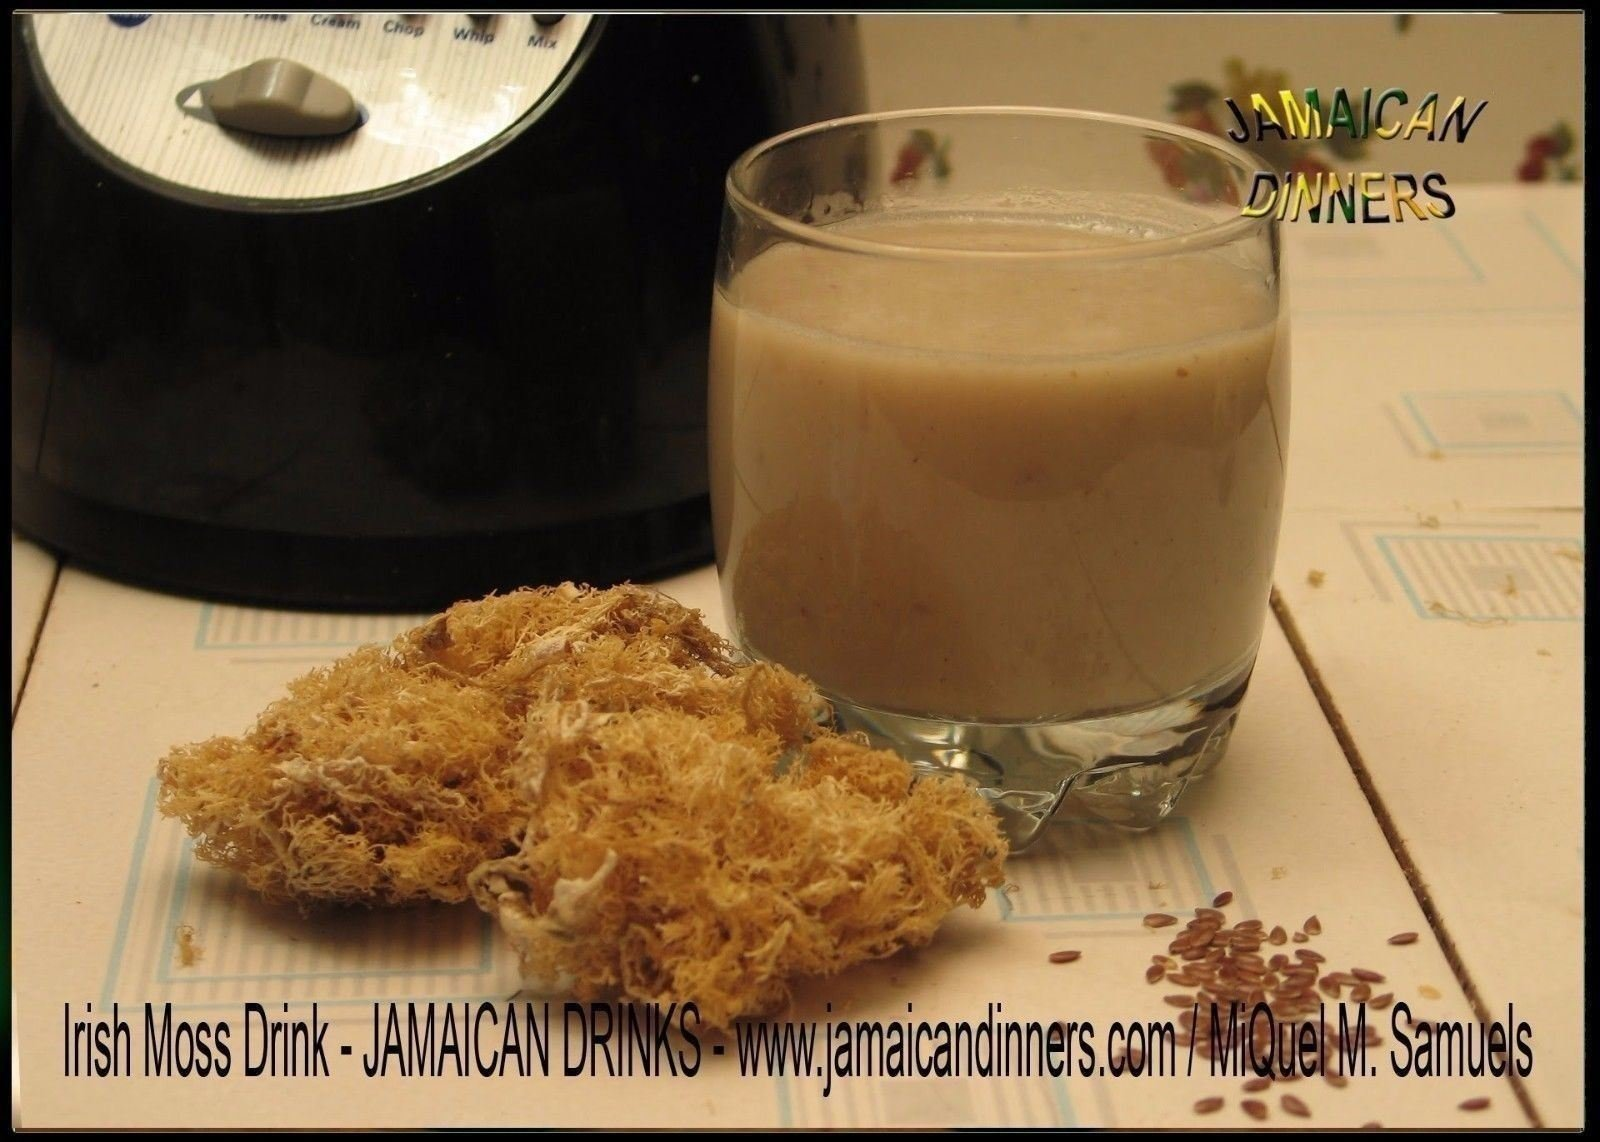 SEA MOSS (RAW) 2 lb - NATURAL IRISH MOSS ,CHONDRUS CRISPUS,Jamaica Drink Below